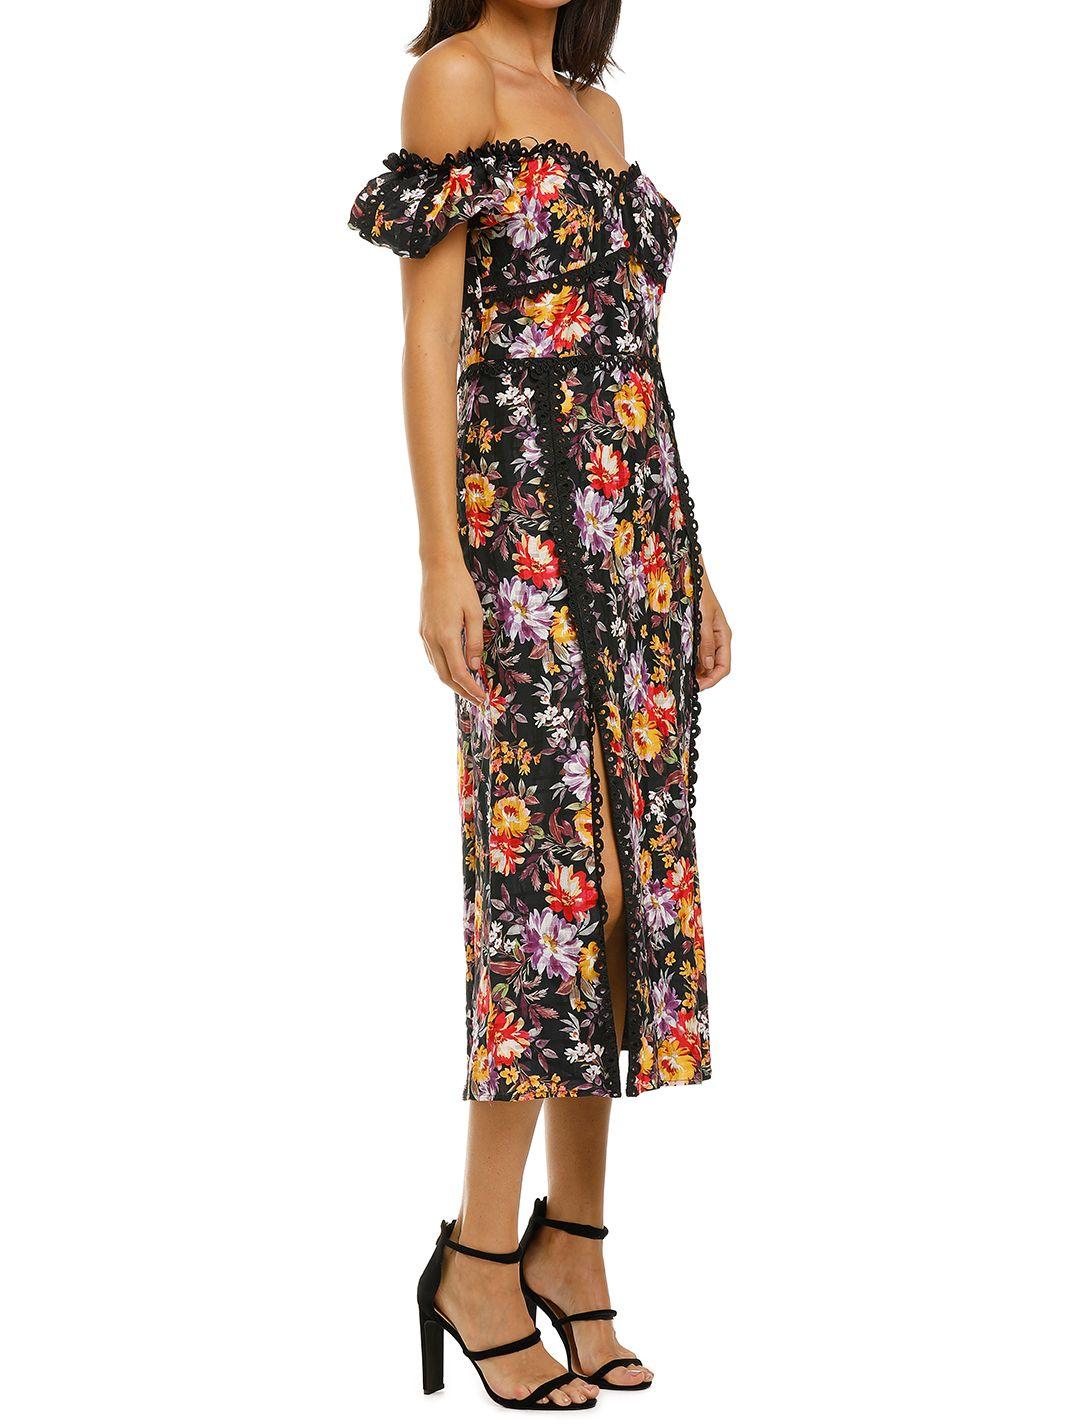 Talulah-Mimosa-Floral-Midi-Dress-Mimosa-Floral-Print-Side